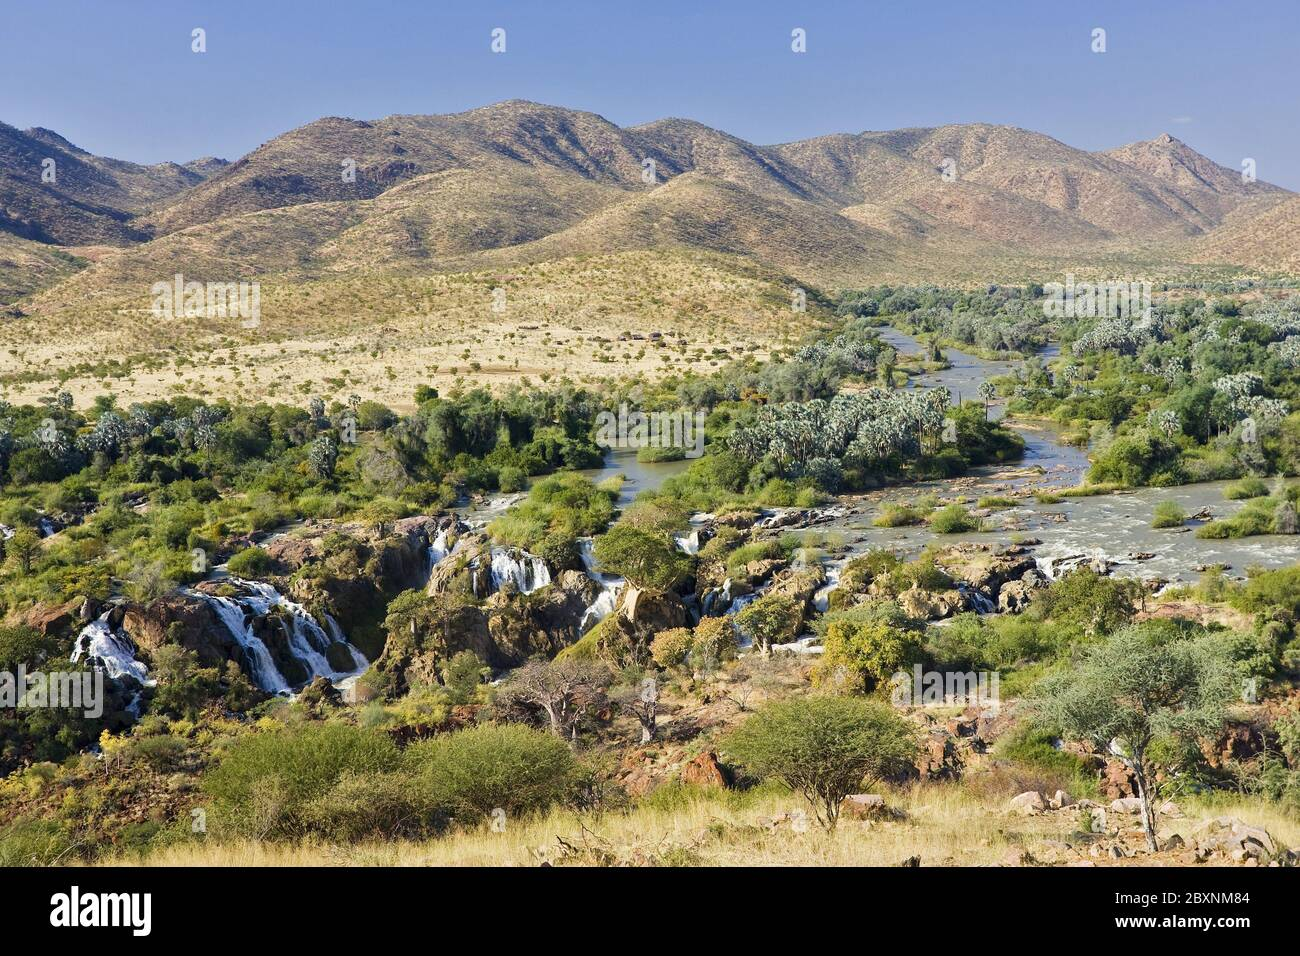 Río Kunene, Kaokoveld, Namibia, Afrika, cataratas Epupa, África Foto de stock